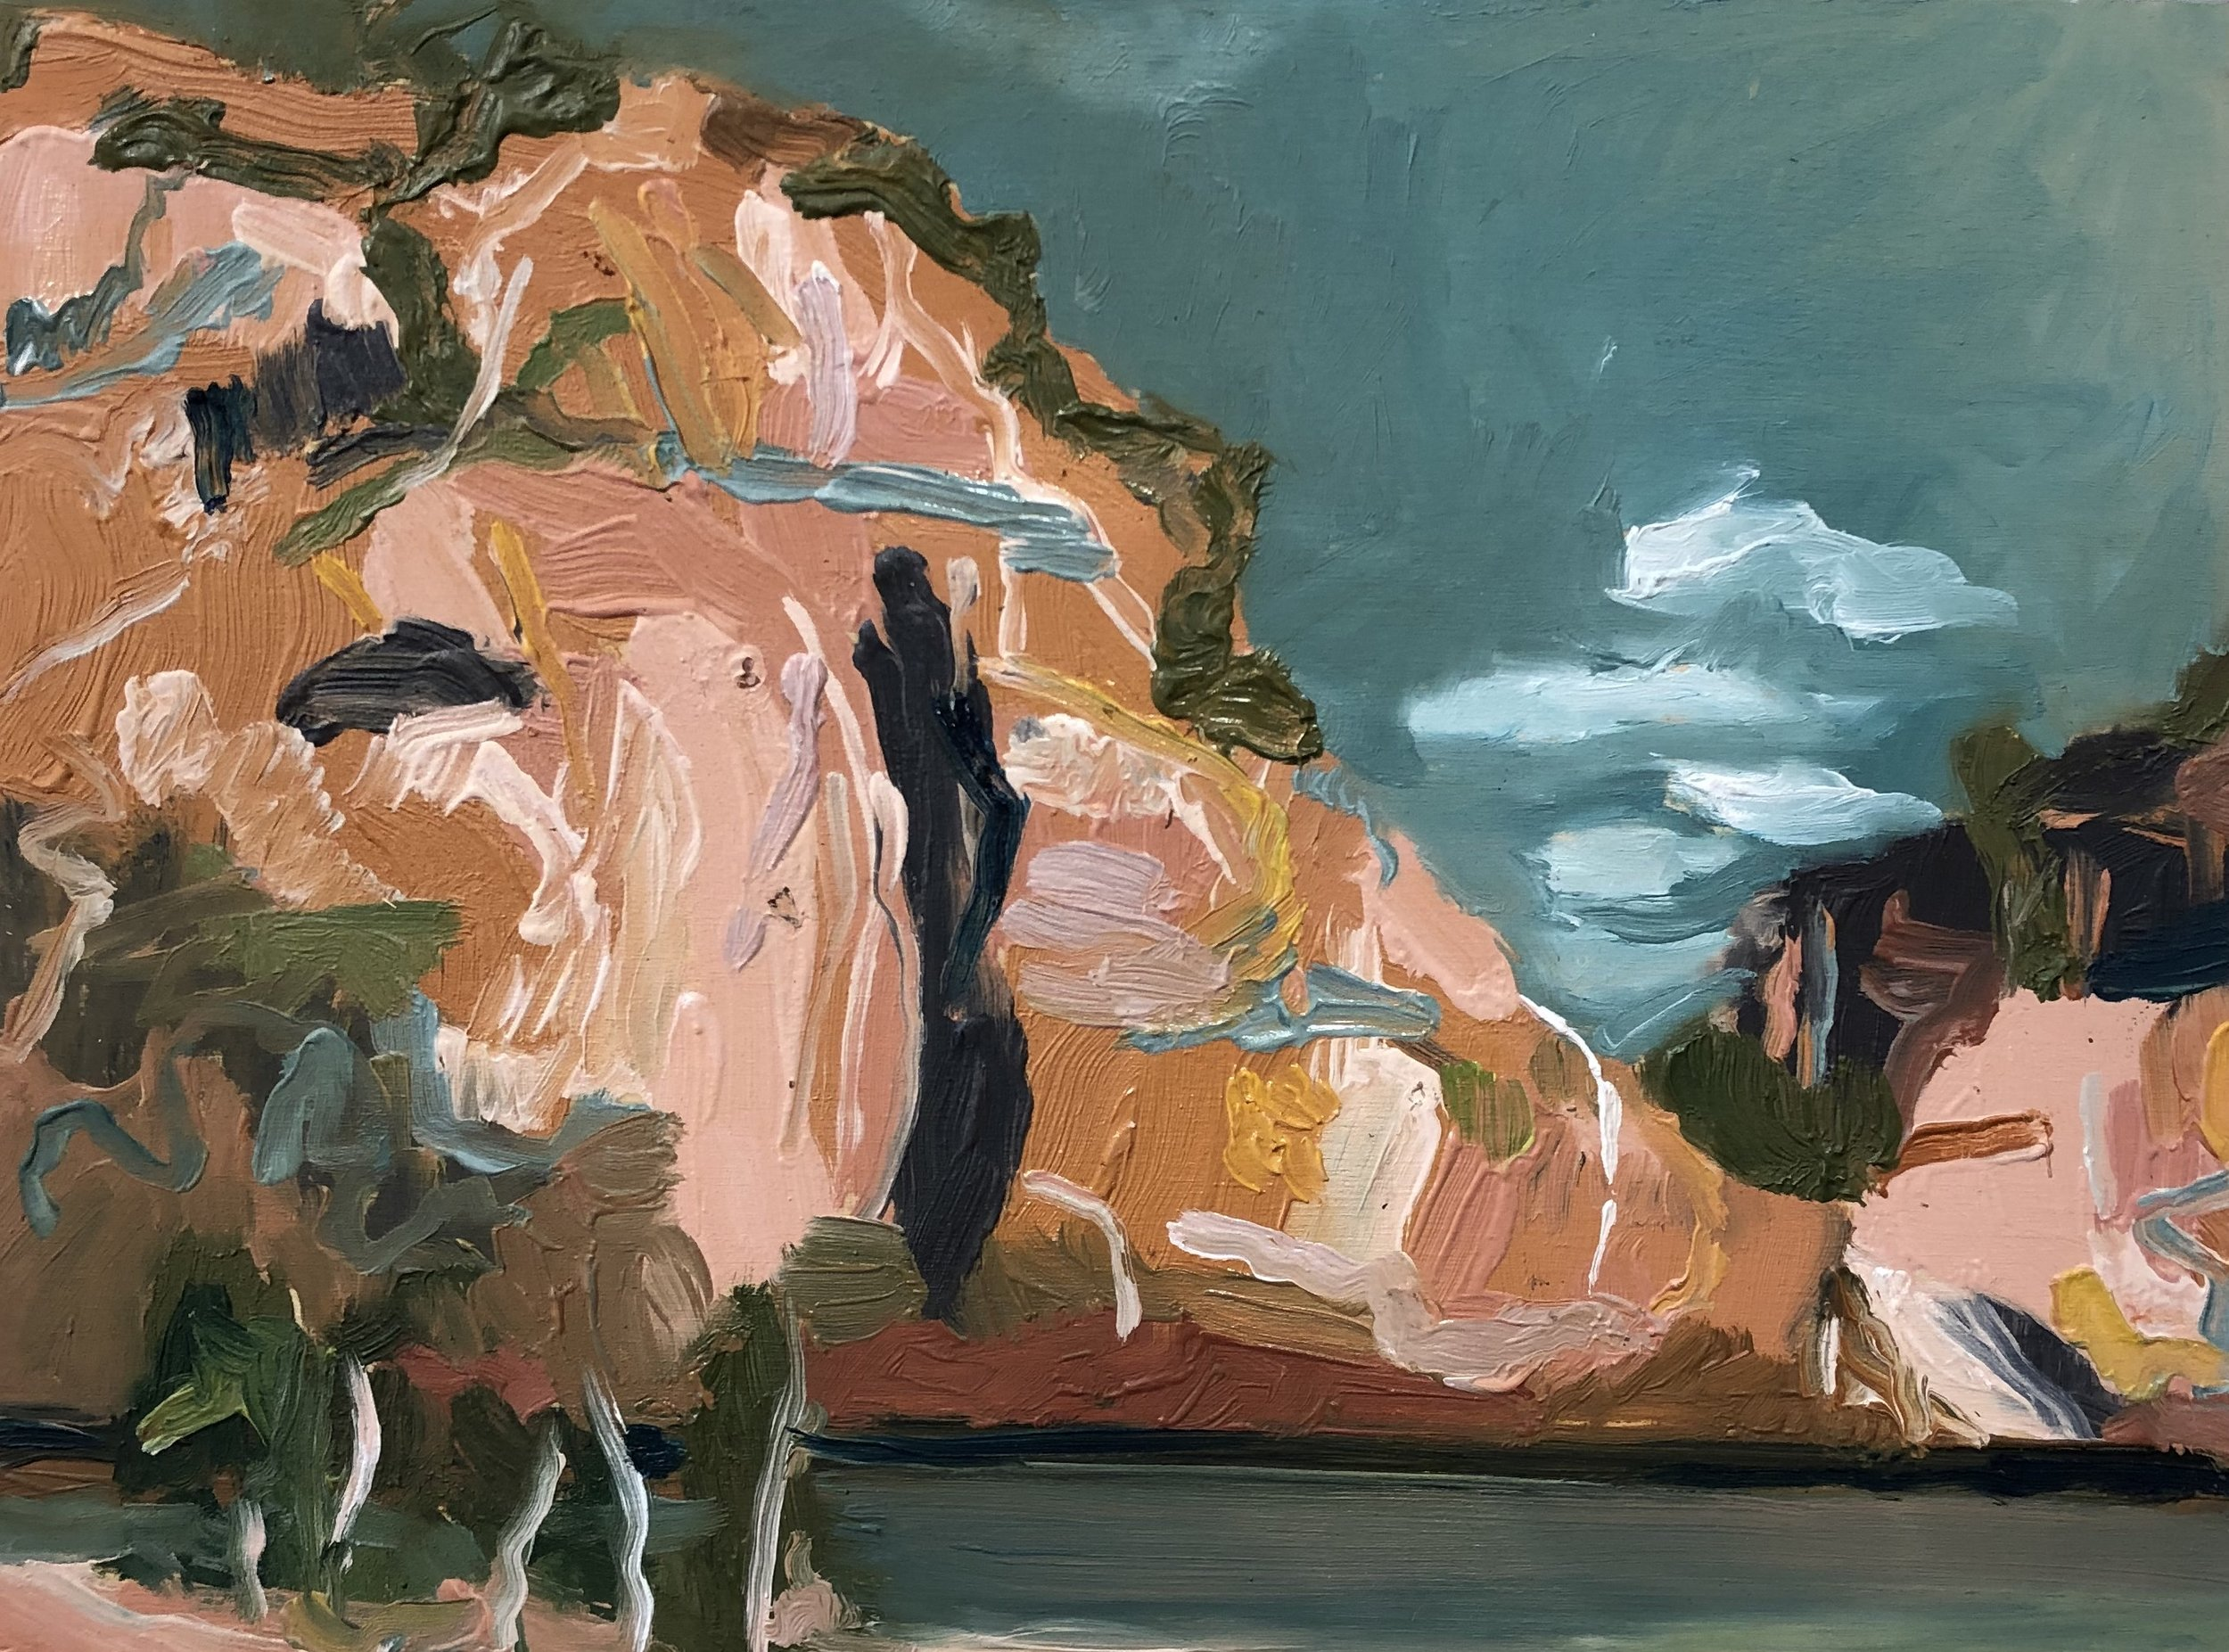 Michelle Teear The Rock at Edith 2019  (En plein study at Edith Falls, Nitmiluk, NT) Oil on plywood, egg emulsion  300 x 400mm $300.00 unframed  $400.00 framed